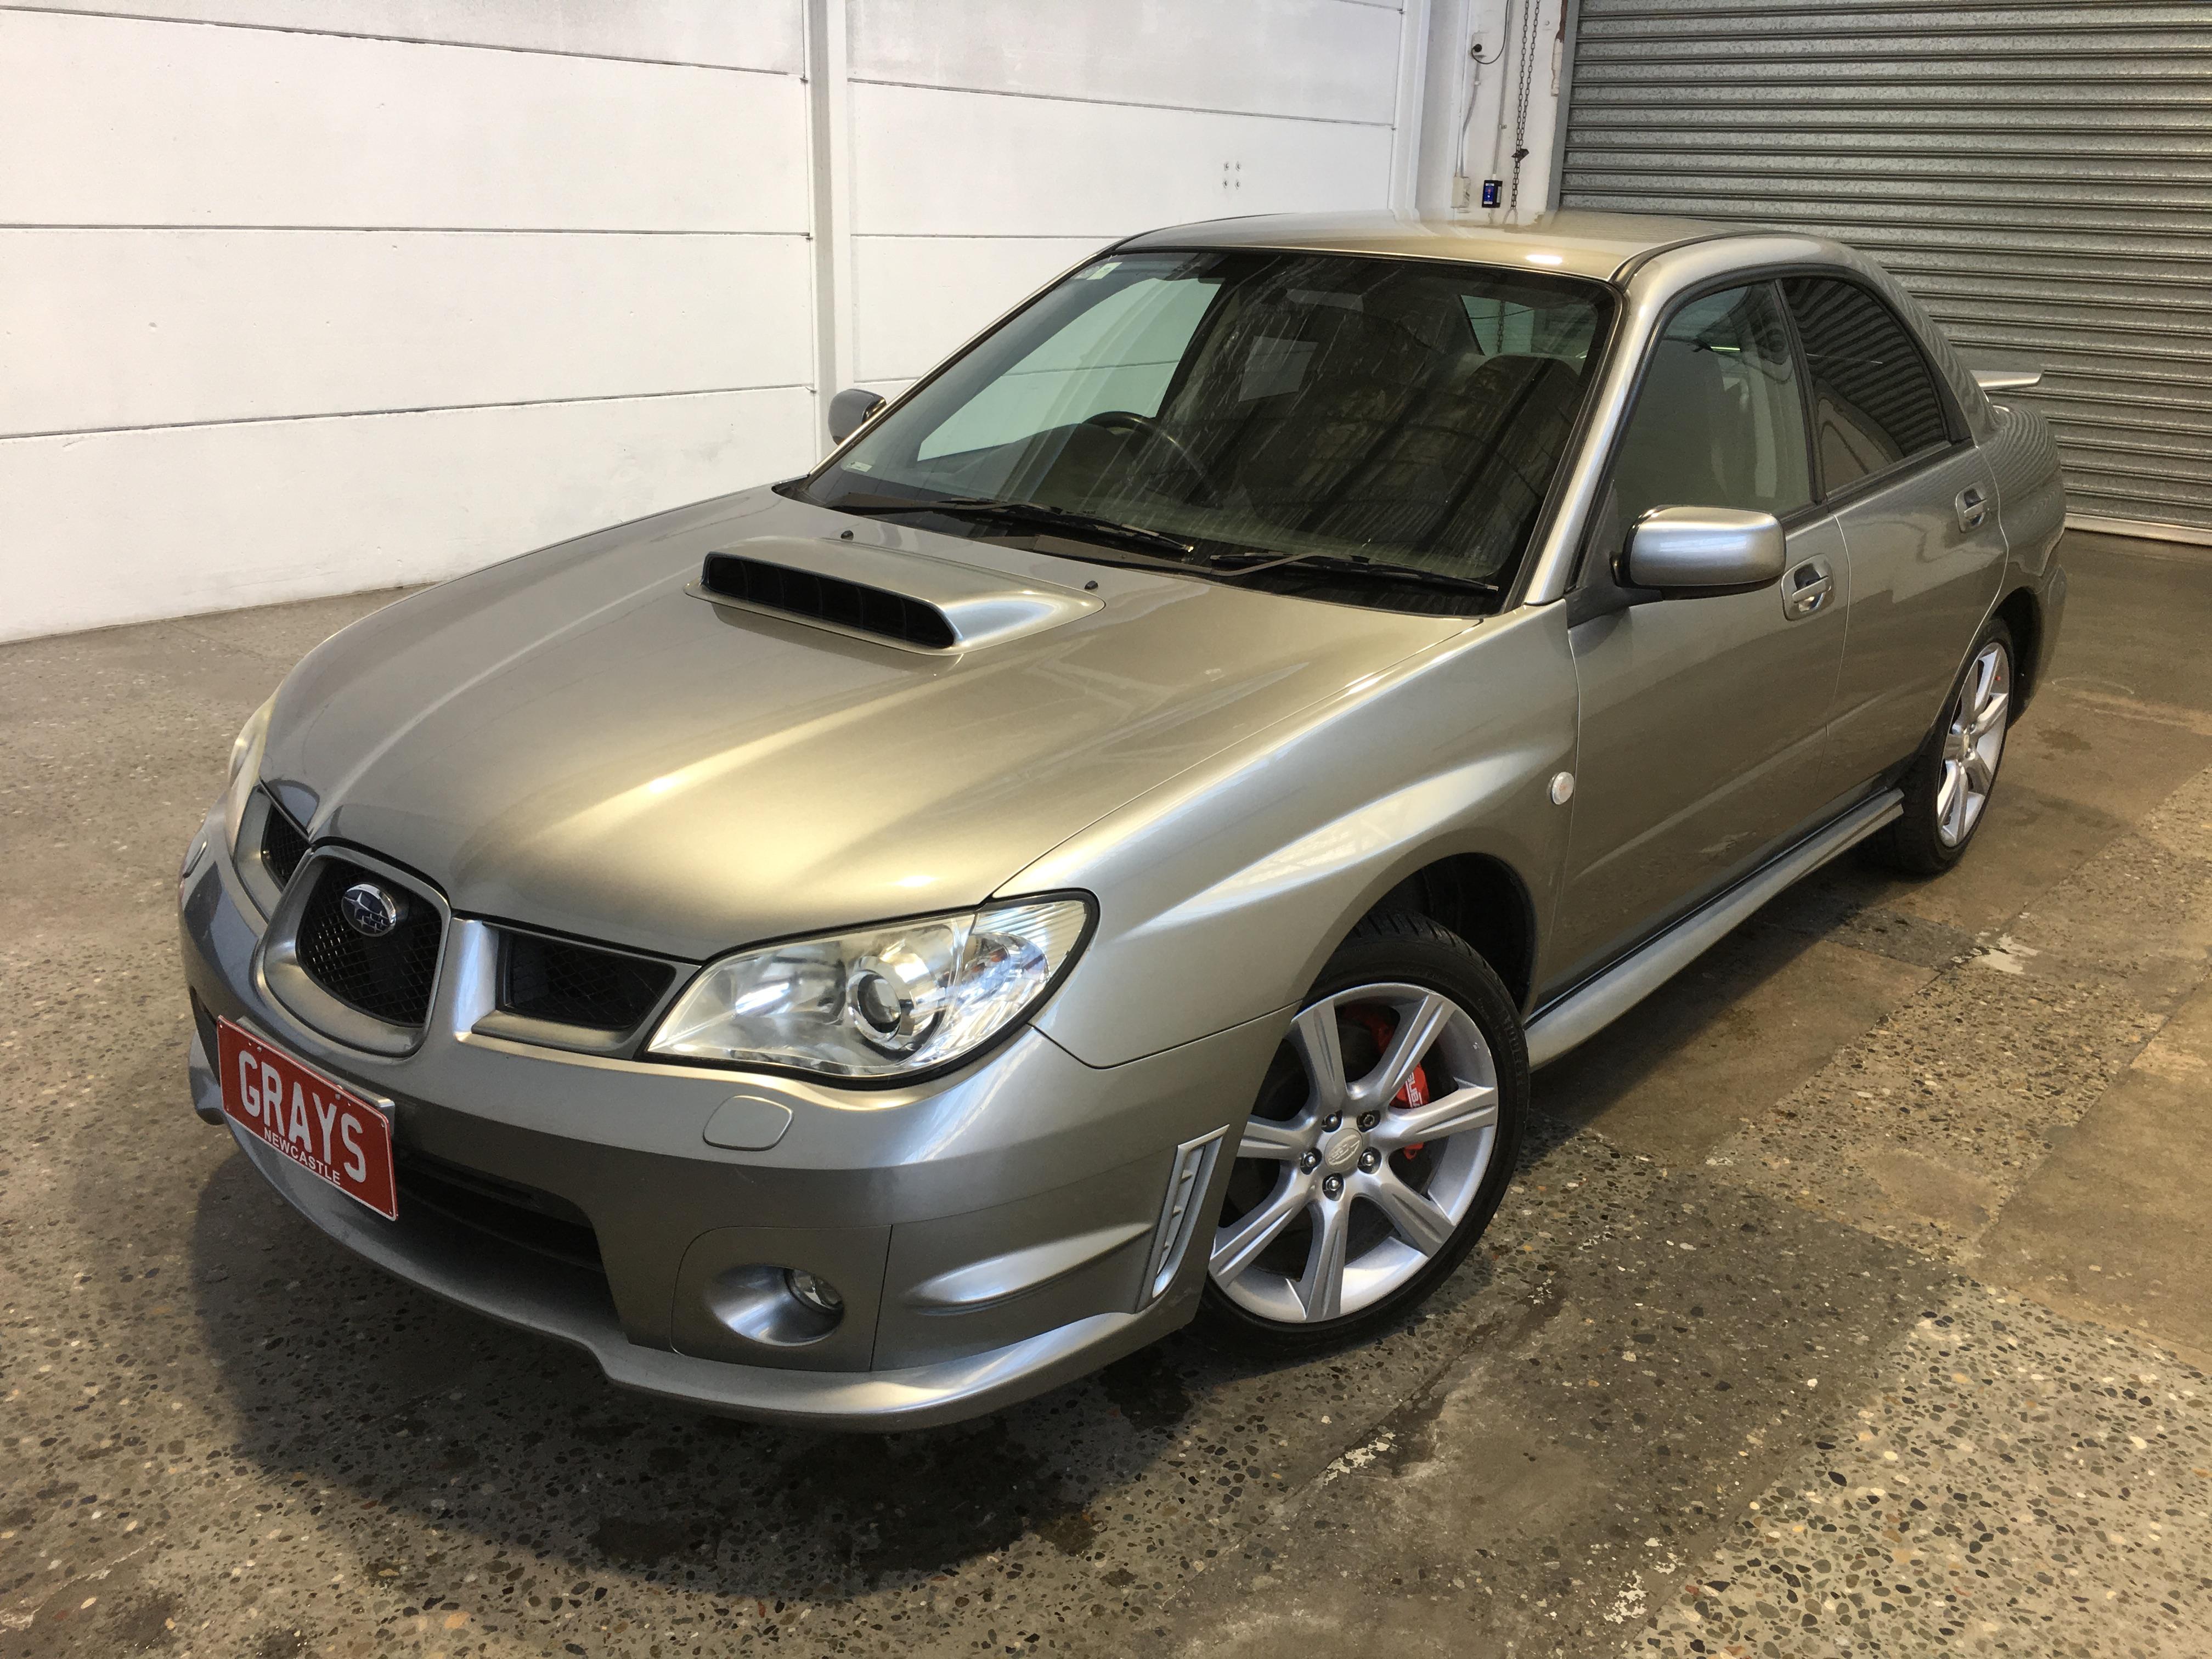 2007 Subaru Impreza Haynes Online Repair Manual-Select Access Auto ...